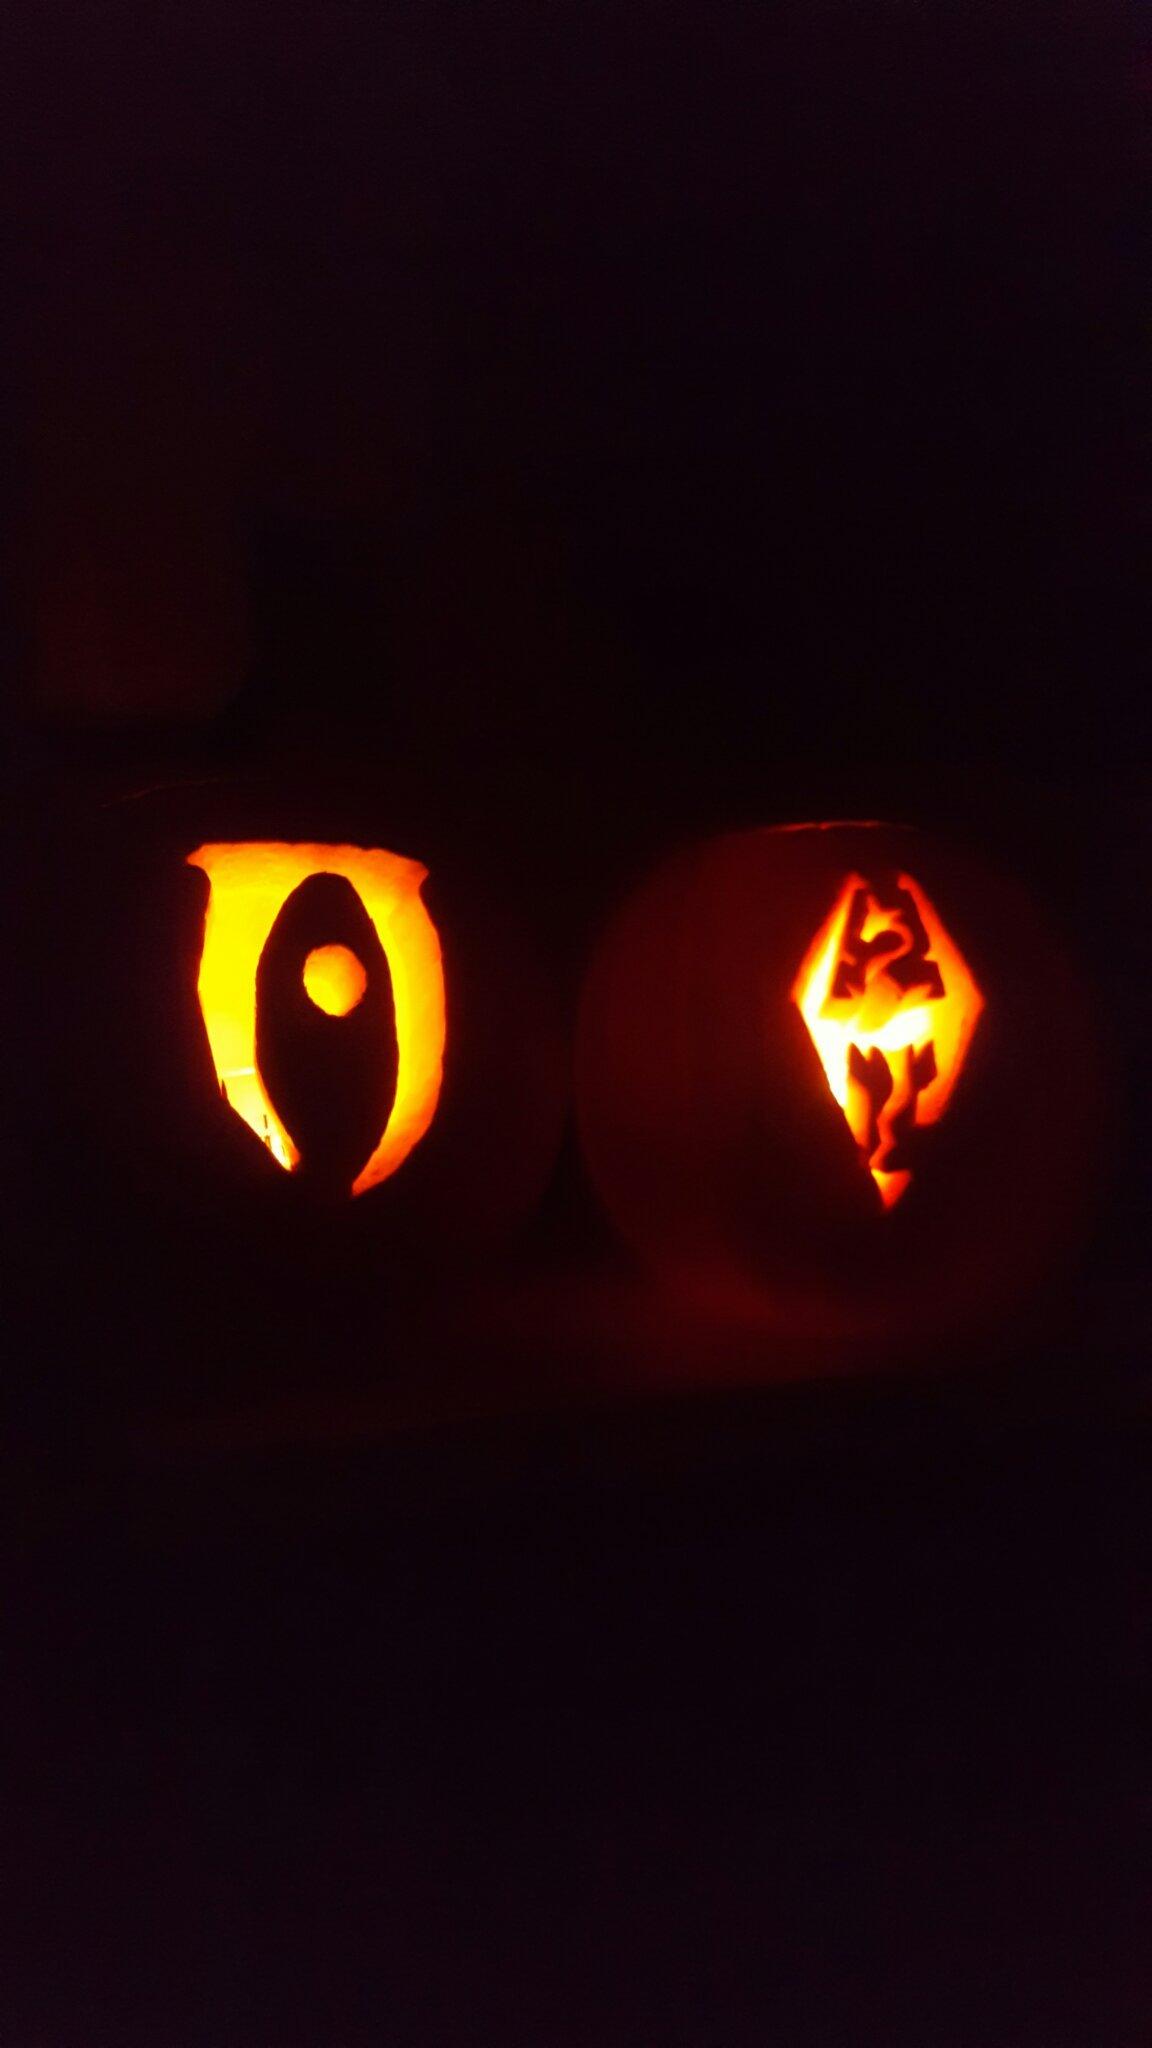 Happy Halloween from Tamriel